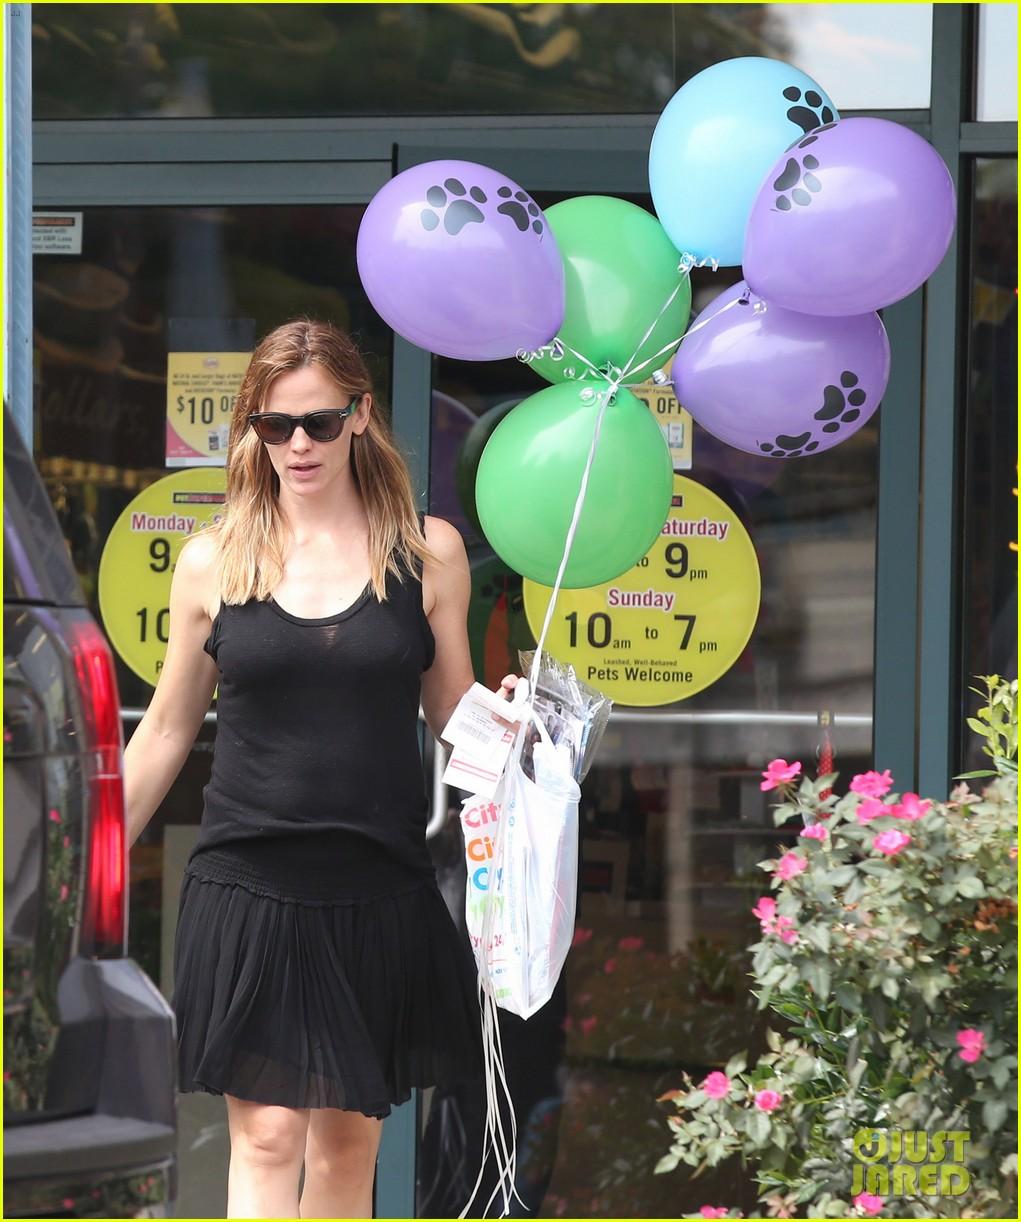 Jennifer Garner Wears Her Wedding Ring To Atlanta Party Store: Photo  3419312  Jennifer Garner Pictures  Just Jared